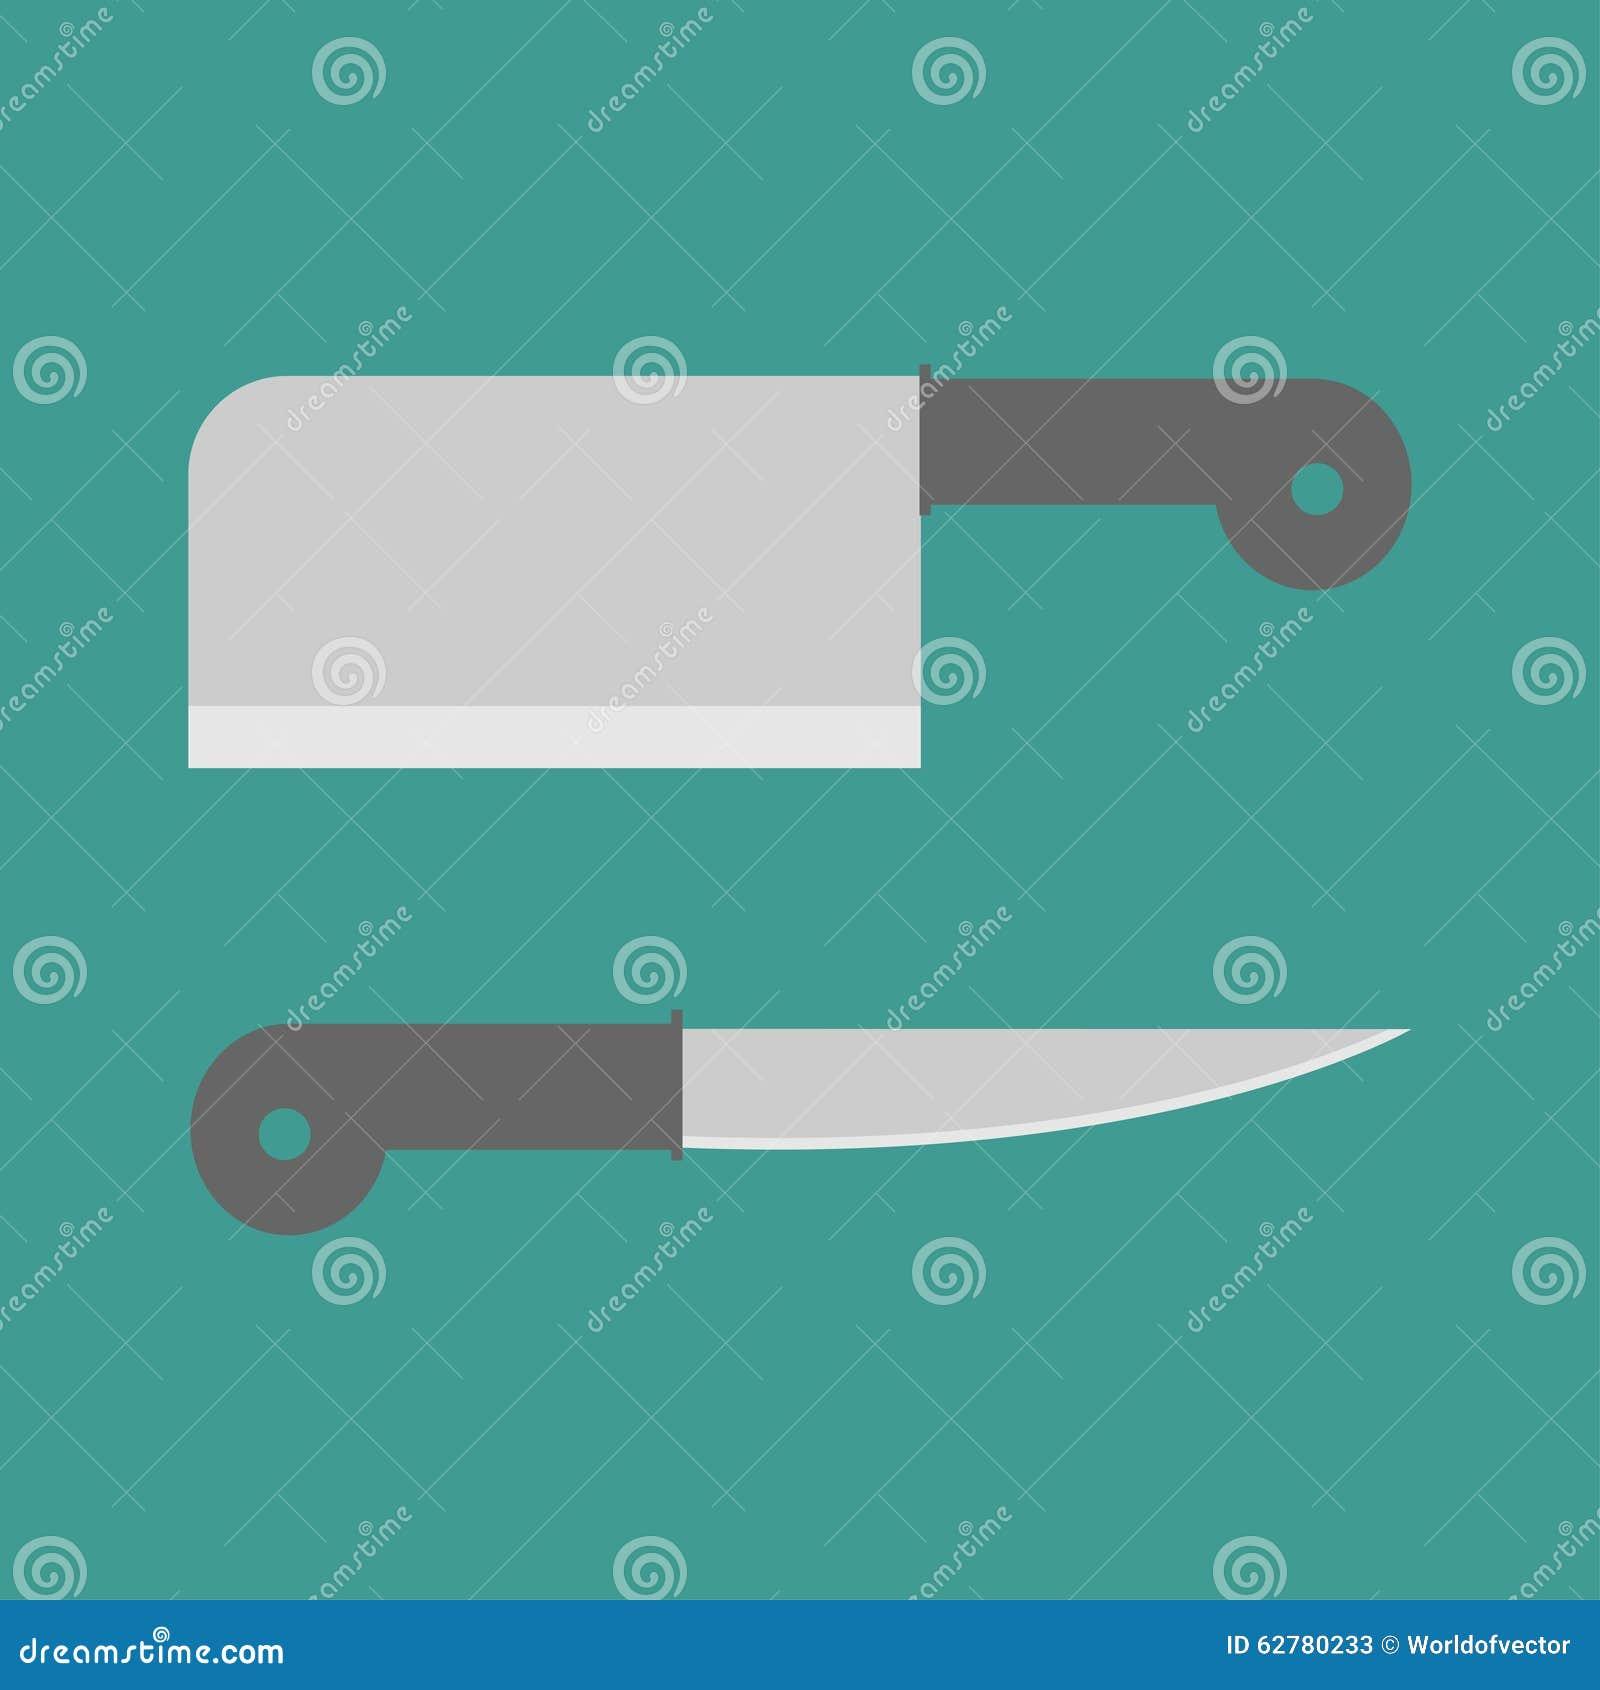 Kitchen Backsplash Design Tool Big Steel Kitchen Knife Set Flat Design Style Cartoon